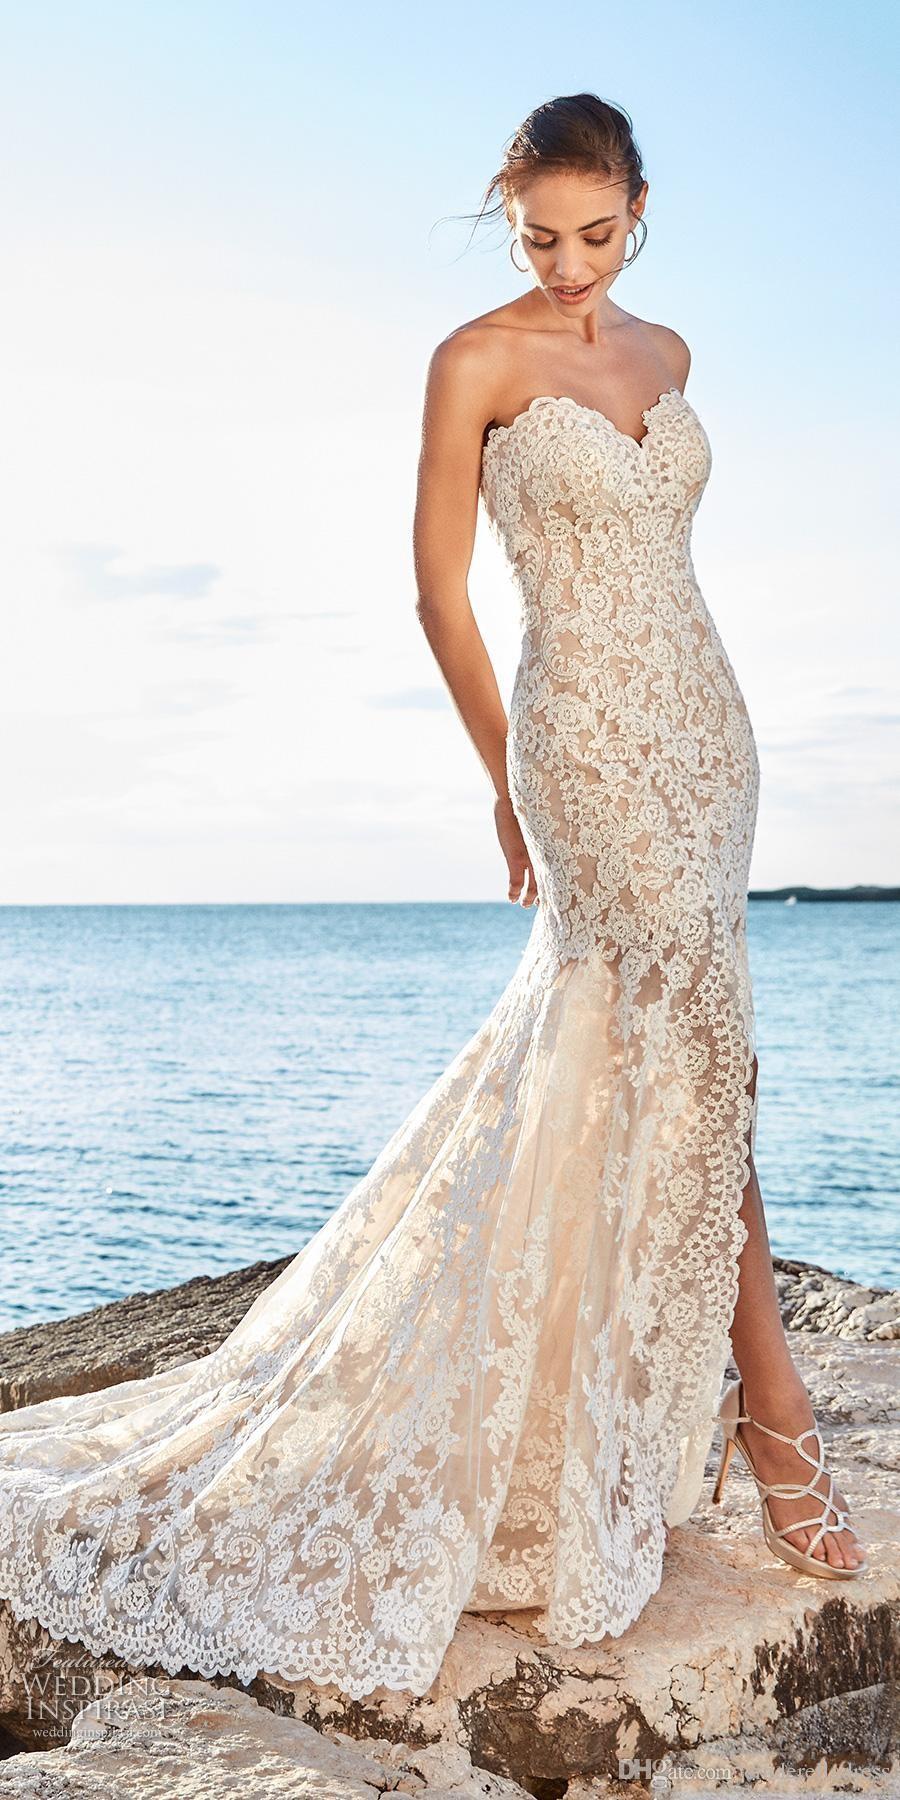 2018 Sexy Beach Mermaid Lace Wedding Dresses Sweetheart Slit Side Front Low Back Bridal Gowns Vestidos De Noiva